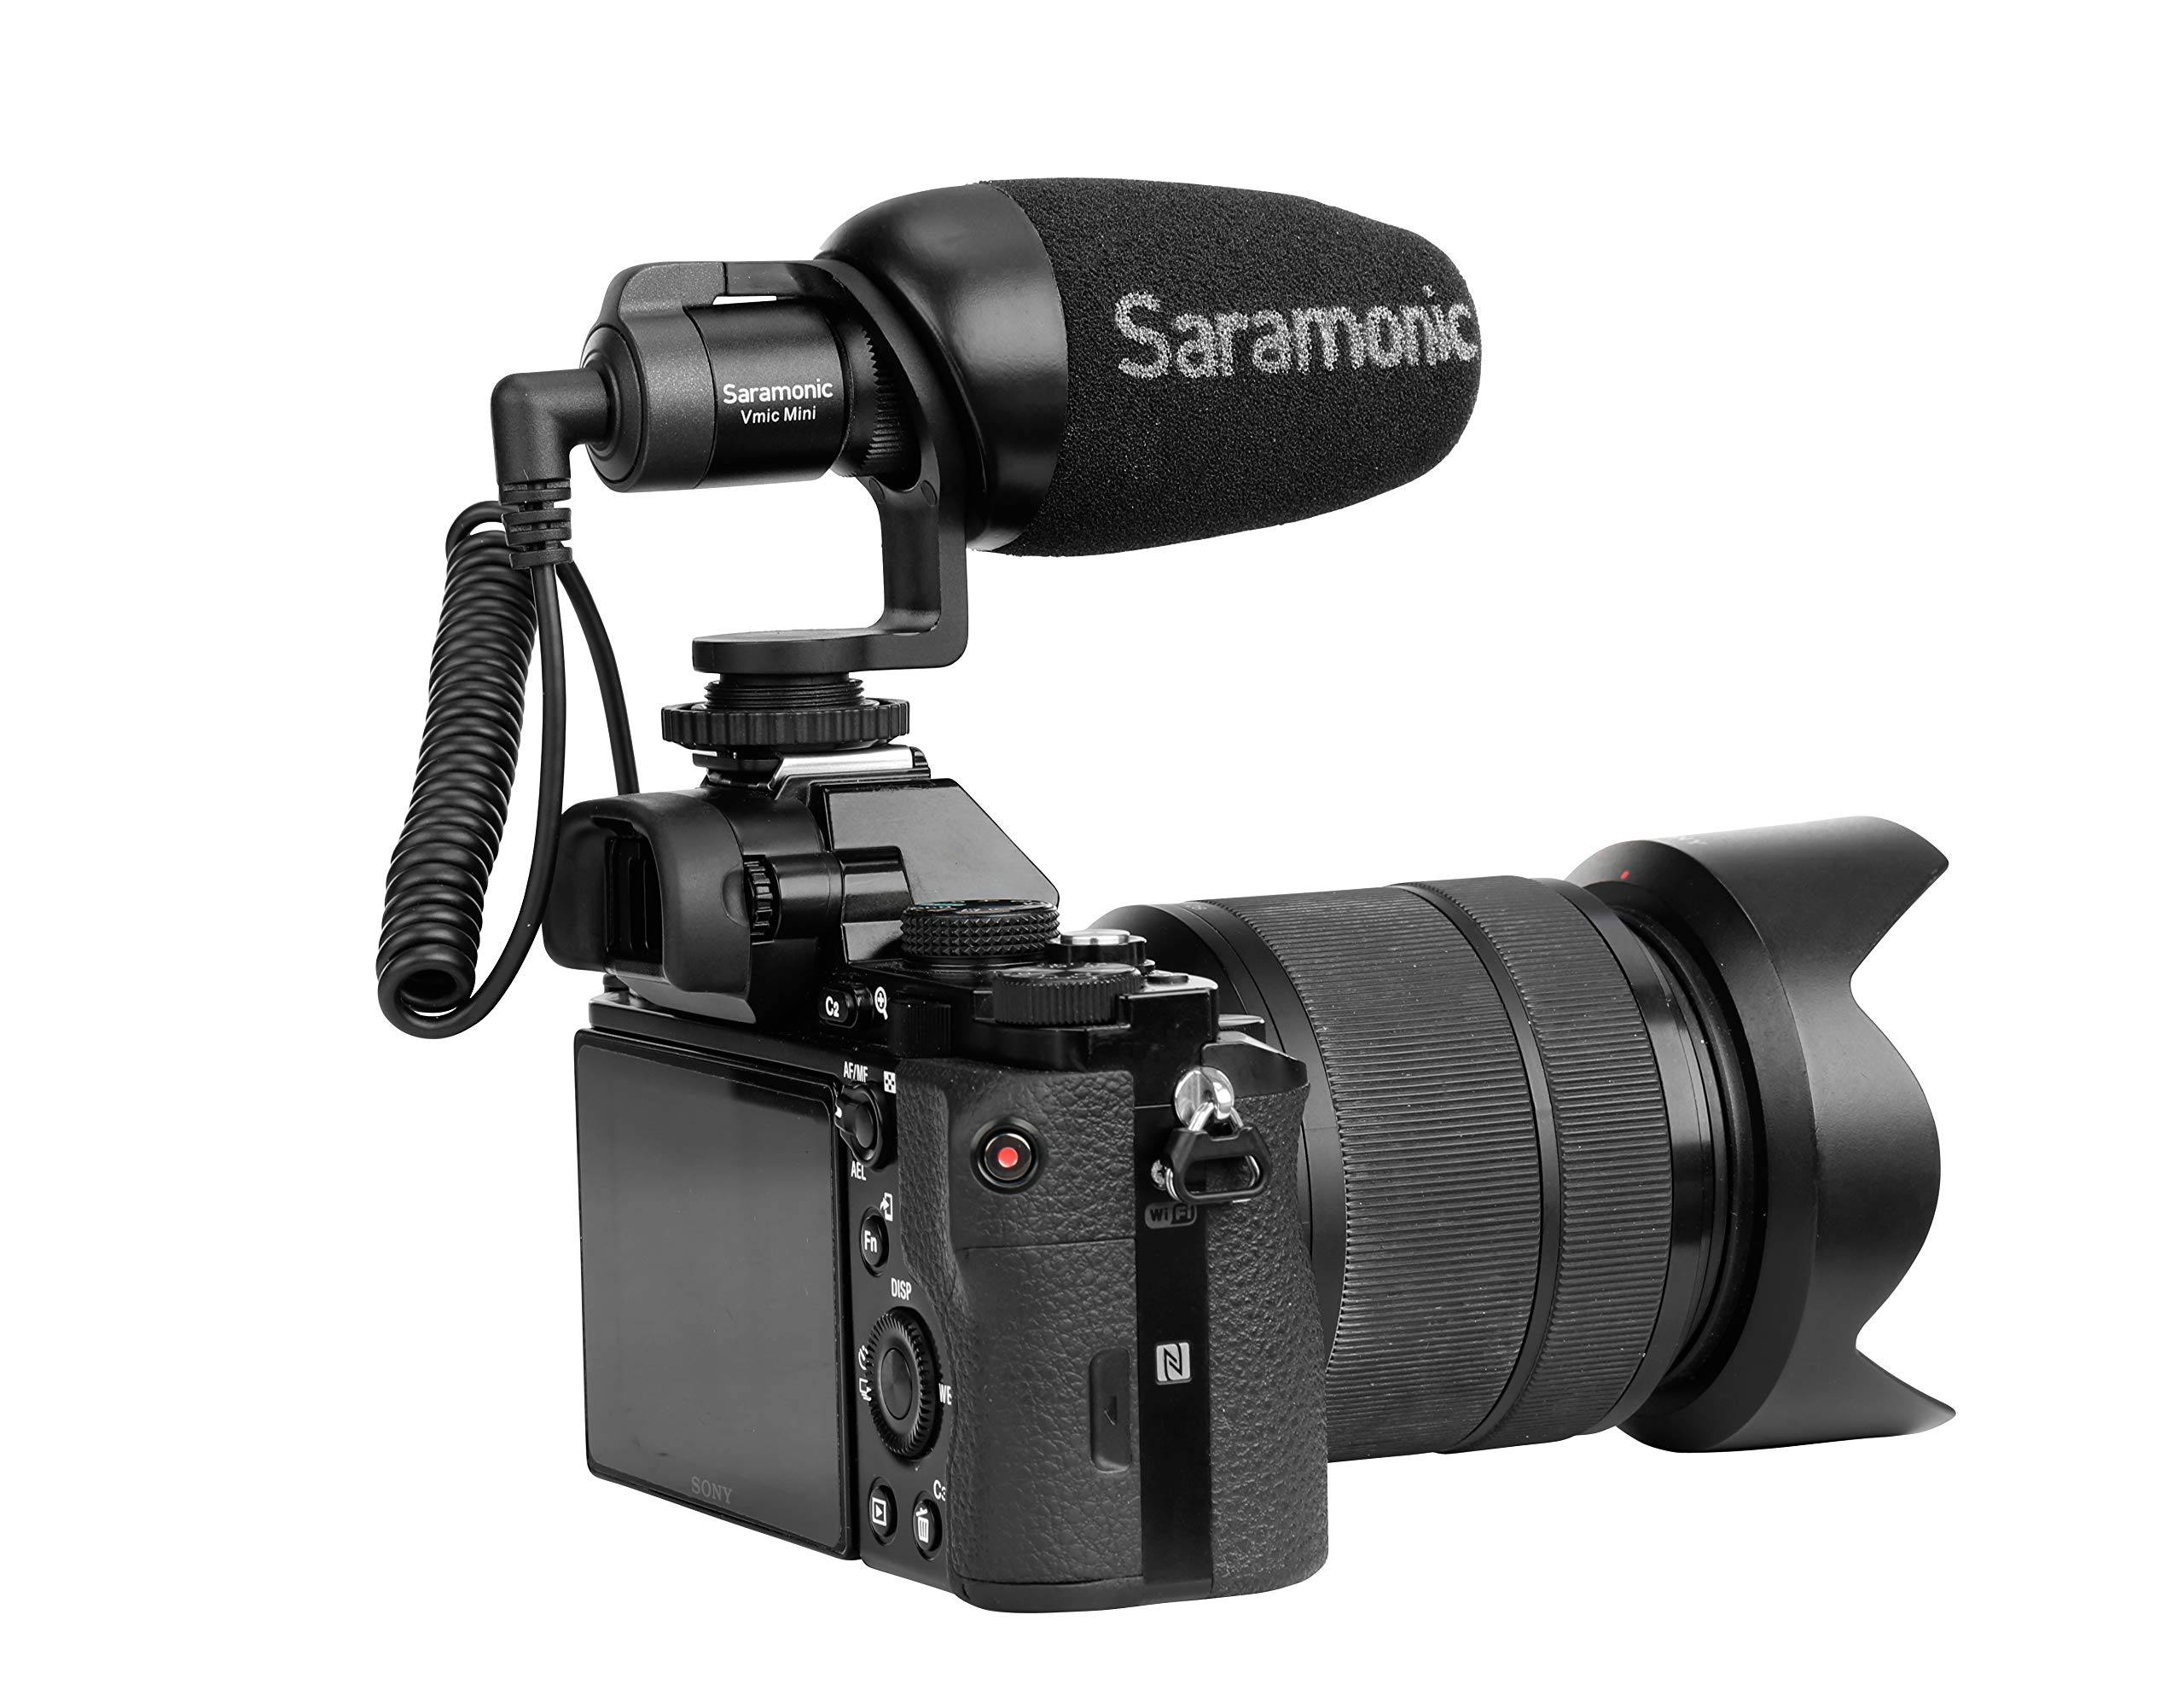 SARAMONIC VMIC MINI MICROFONO DSLR Y SMARTPHONES: Amazon.es ...